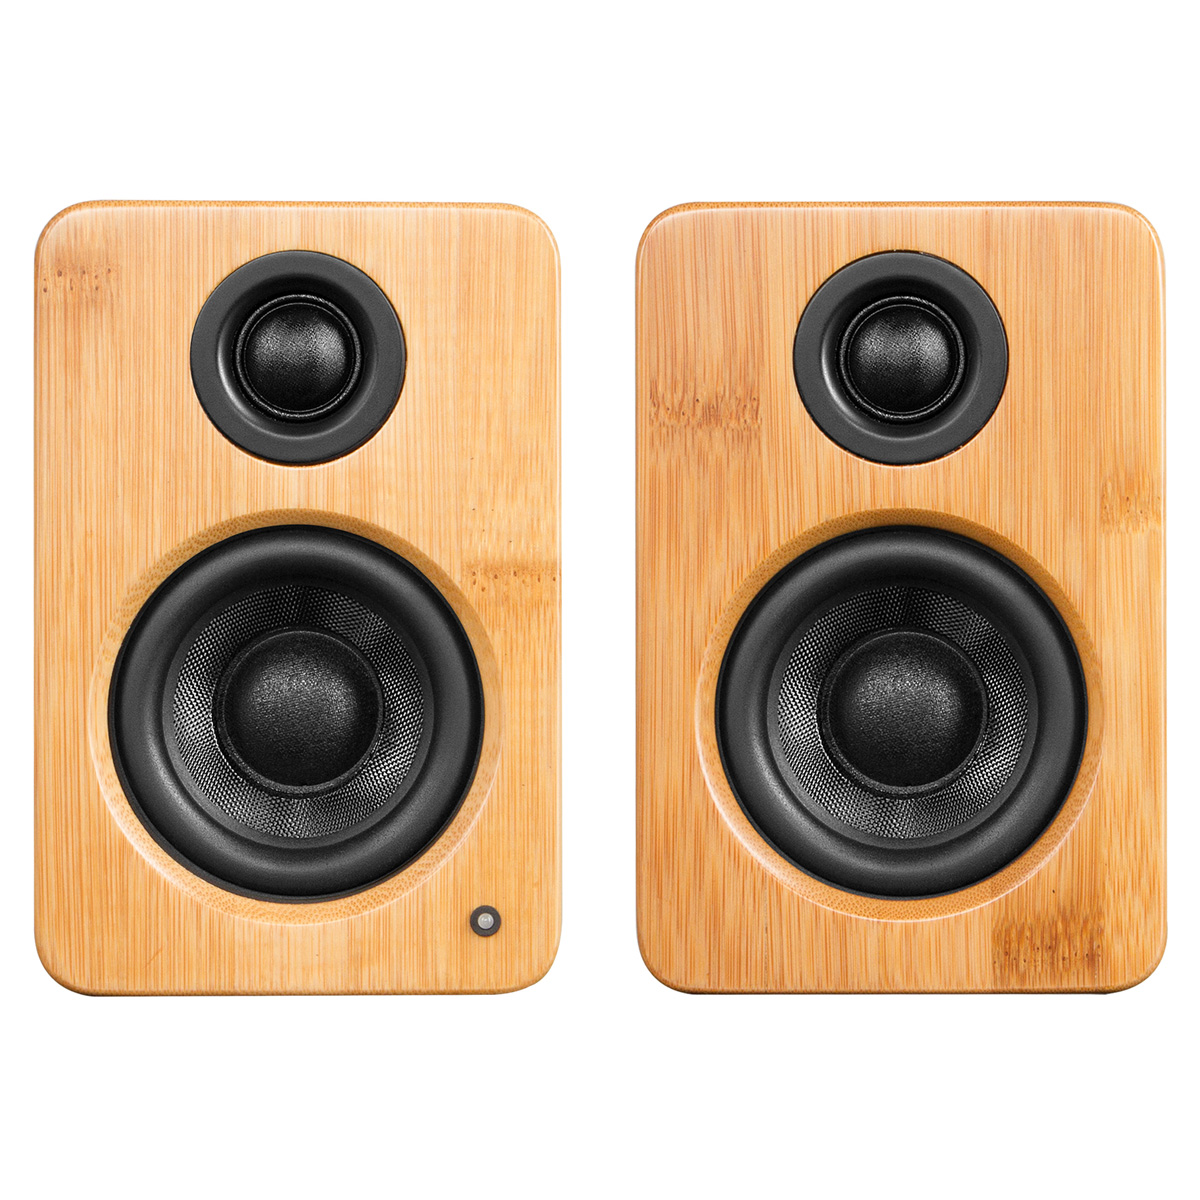 thumbnail 6 - Kanto YU2 Powered Desktop Speakers - Pair